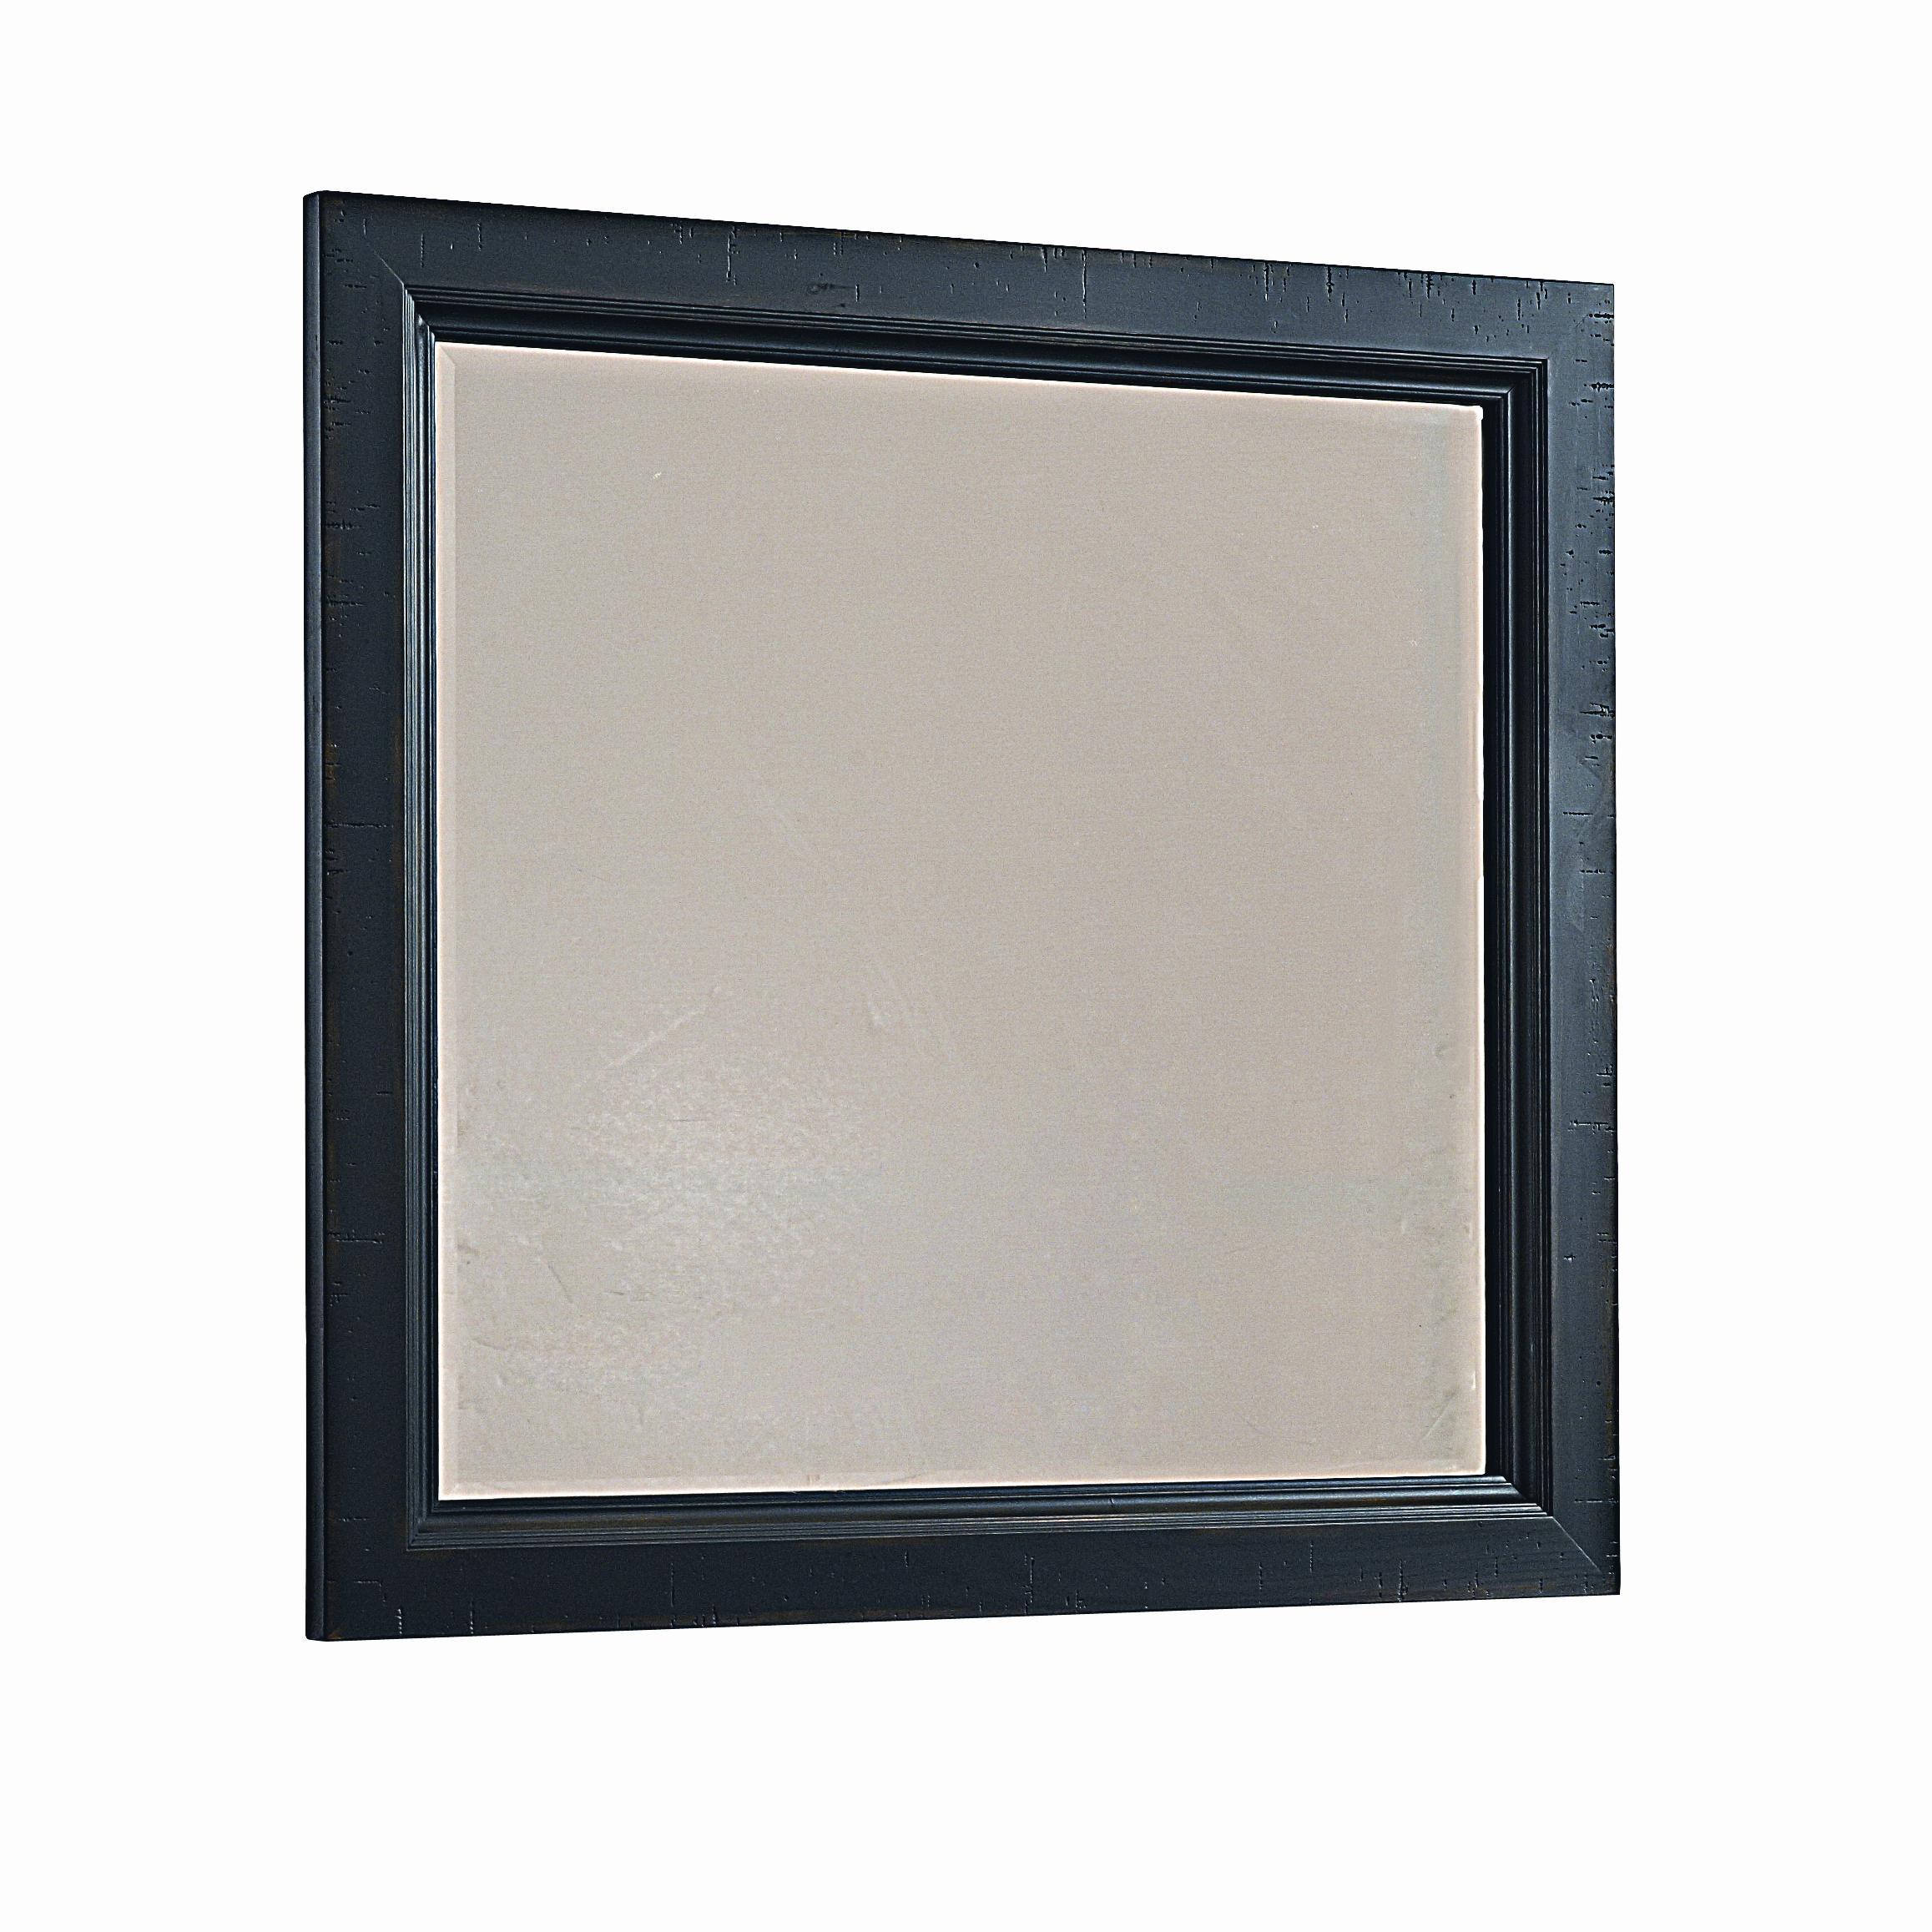 Vaughan Bassett Timber Mill Landscape Mirror - bevel glass - Item Number: BB56-445